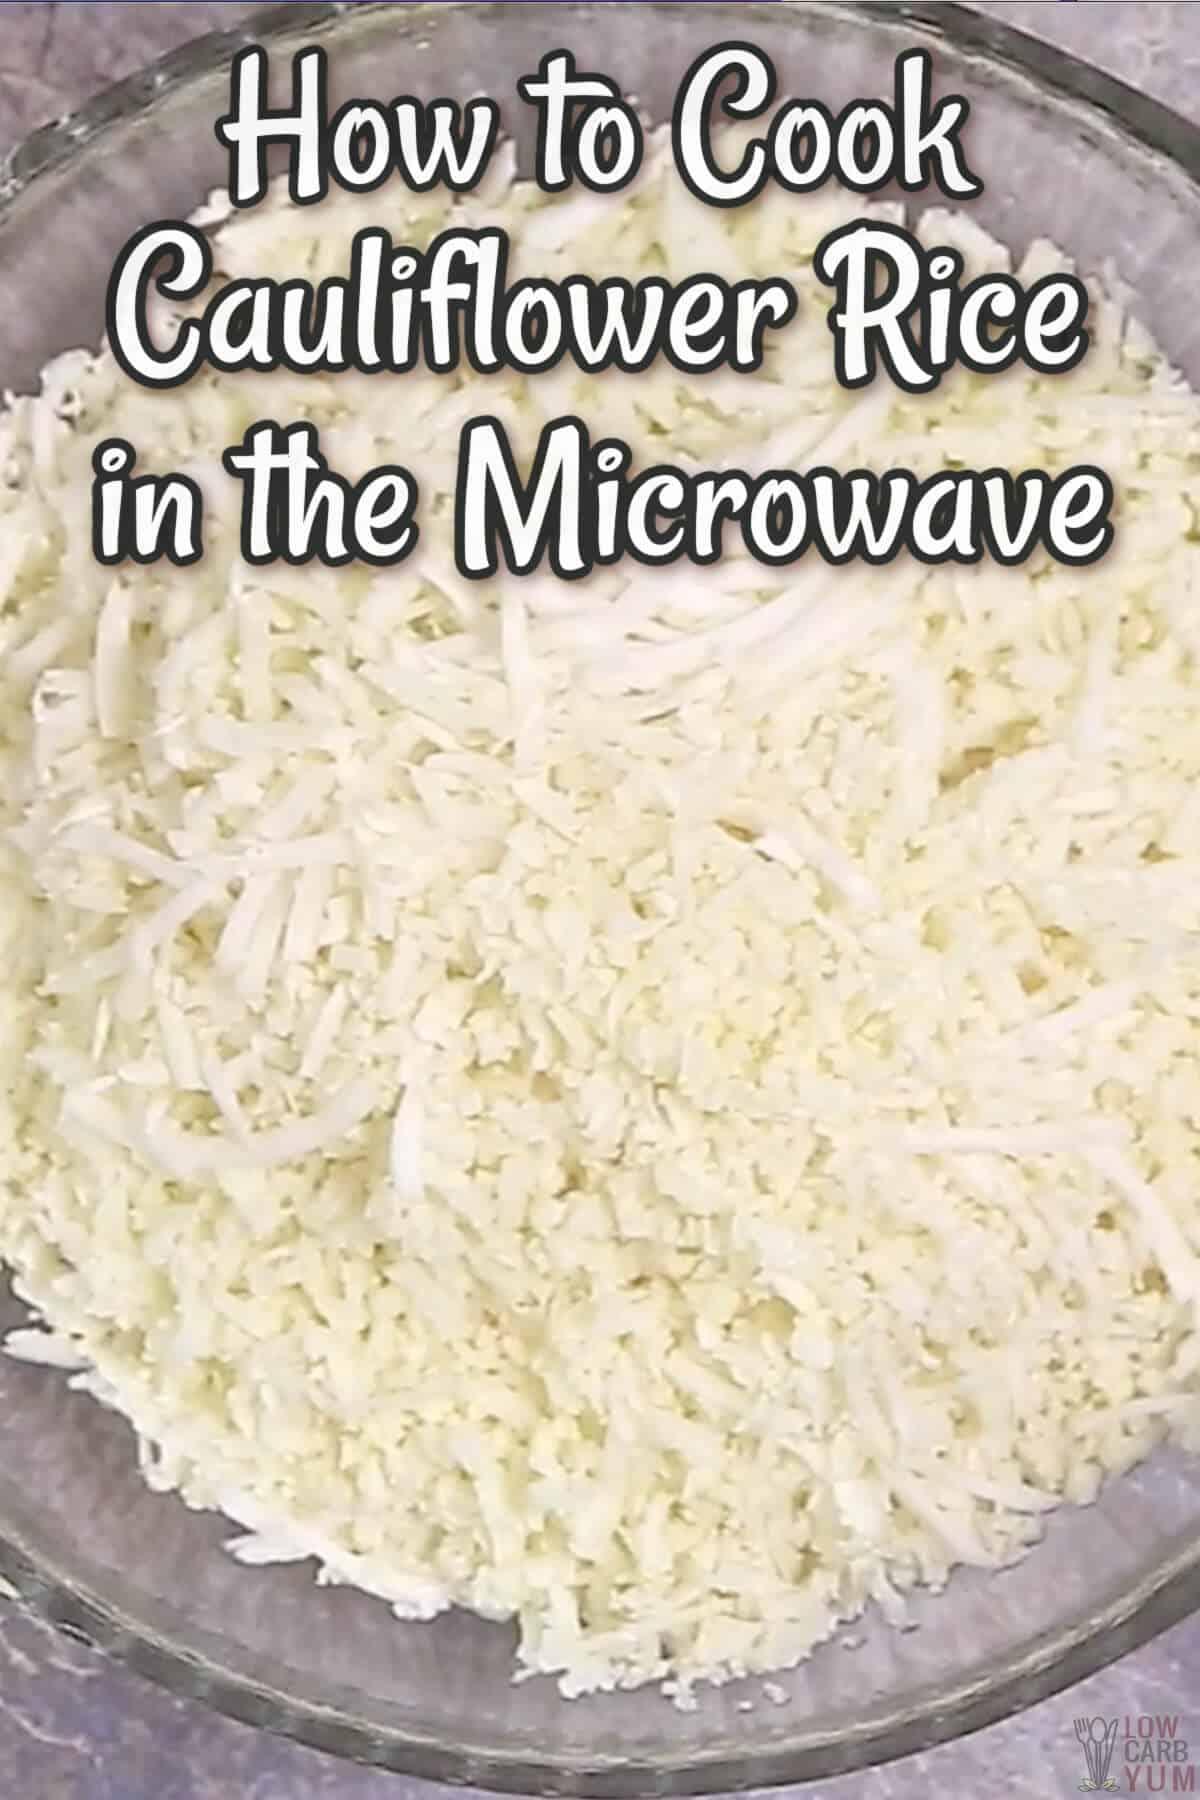 make cauliflower rice in the microwave